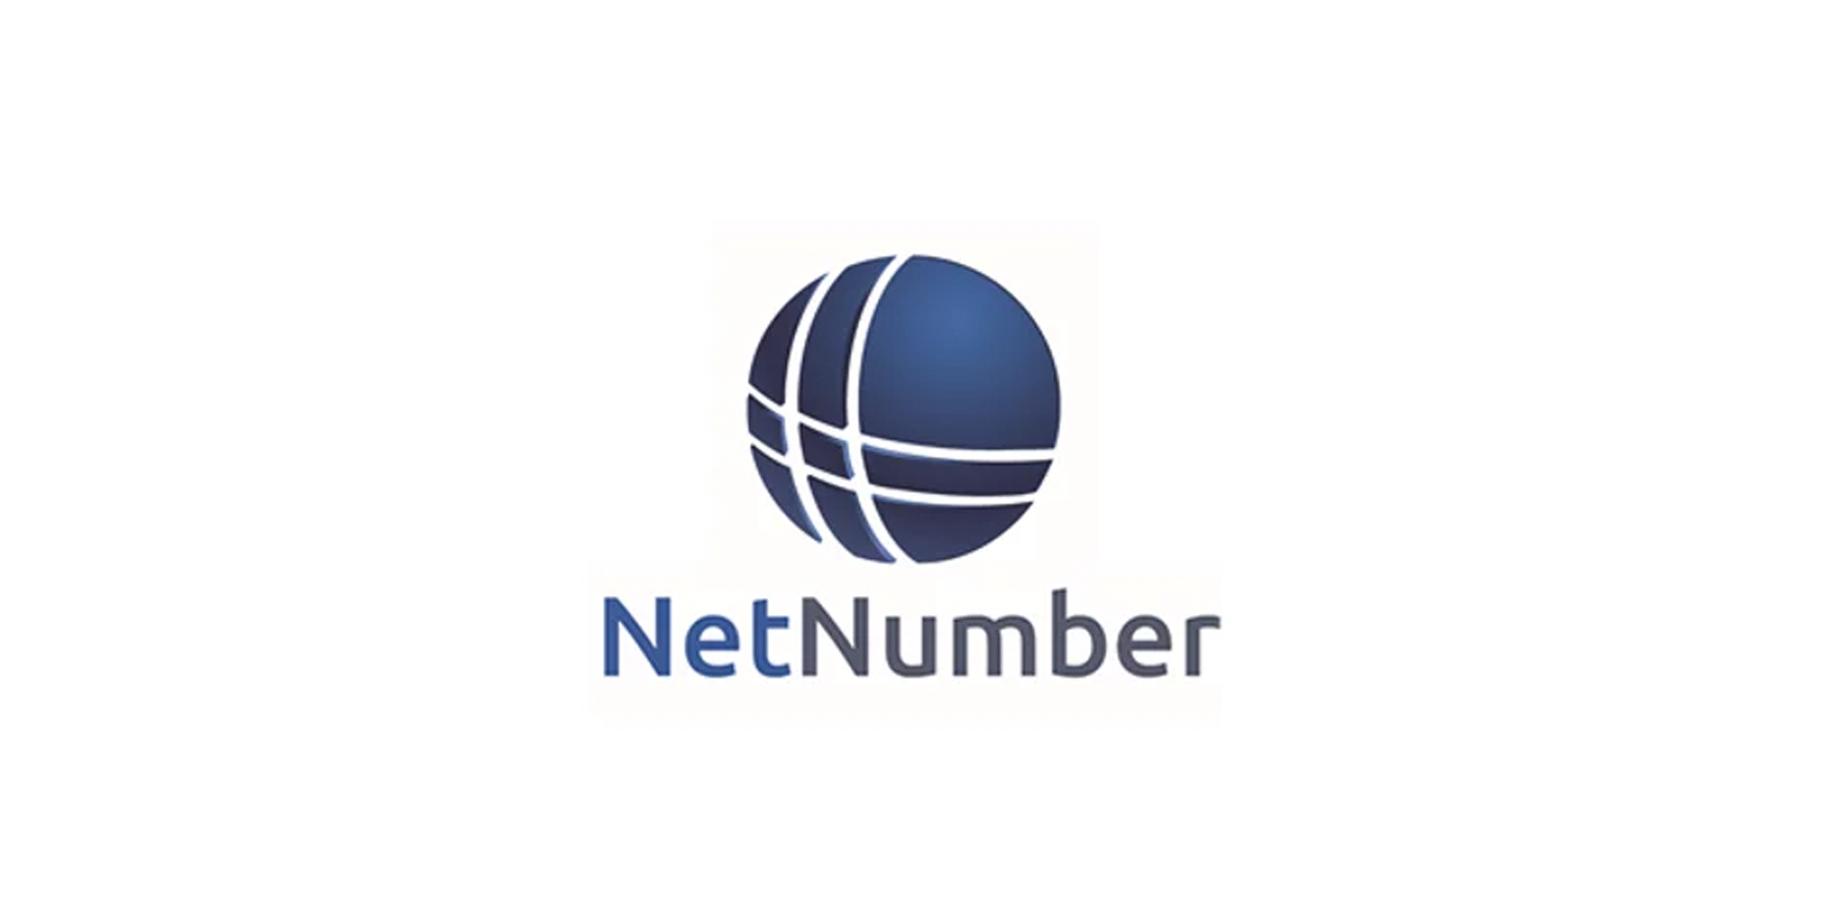 NetNumber Cloudify